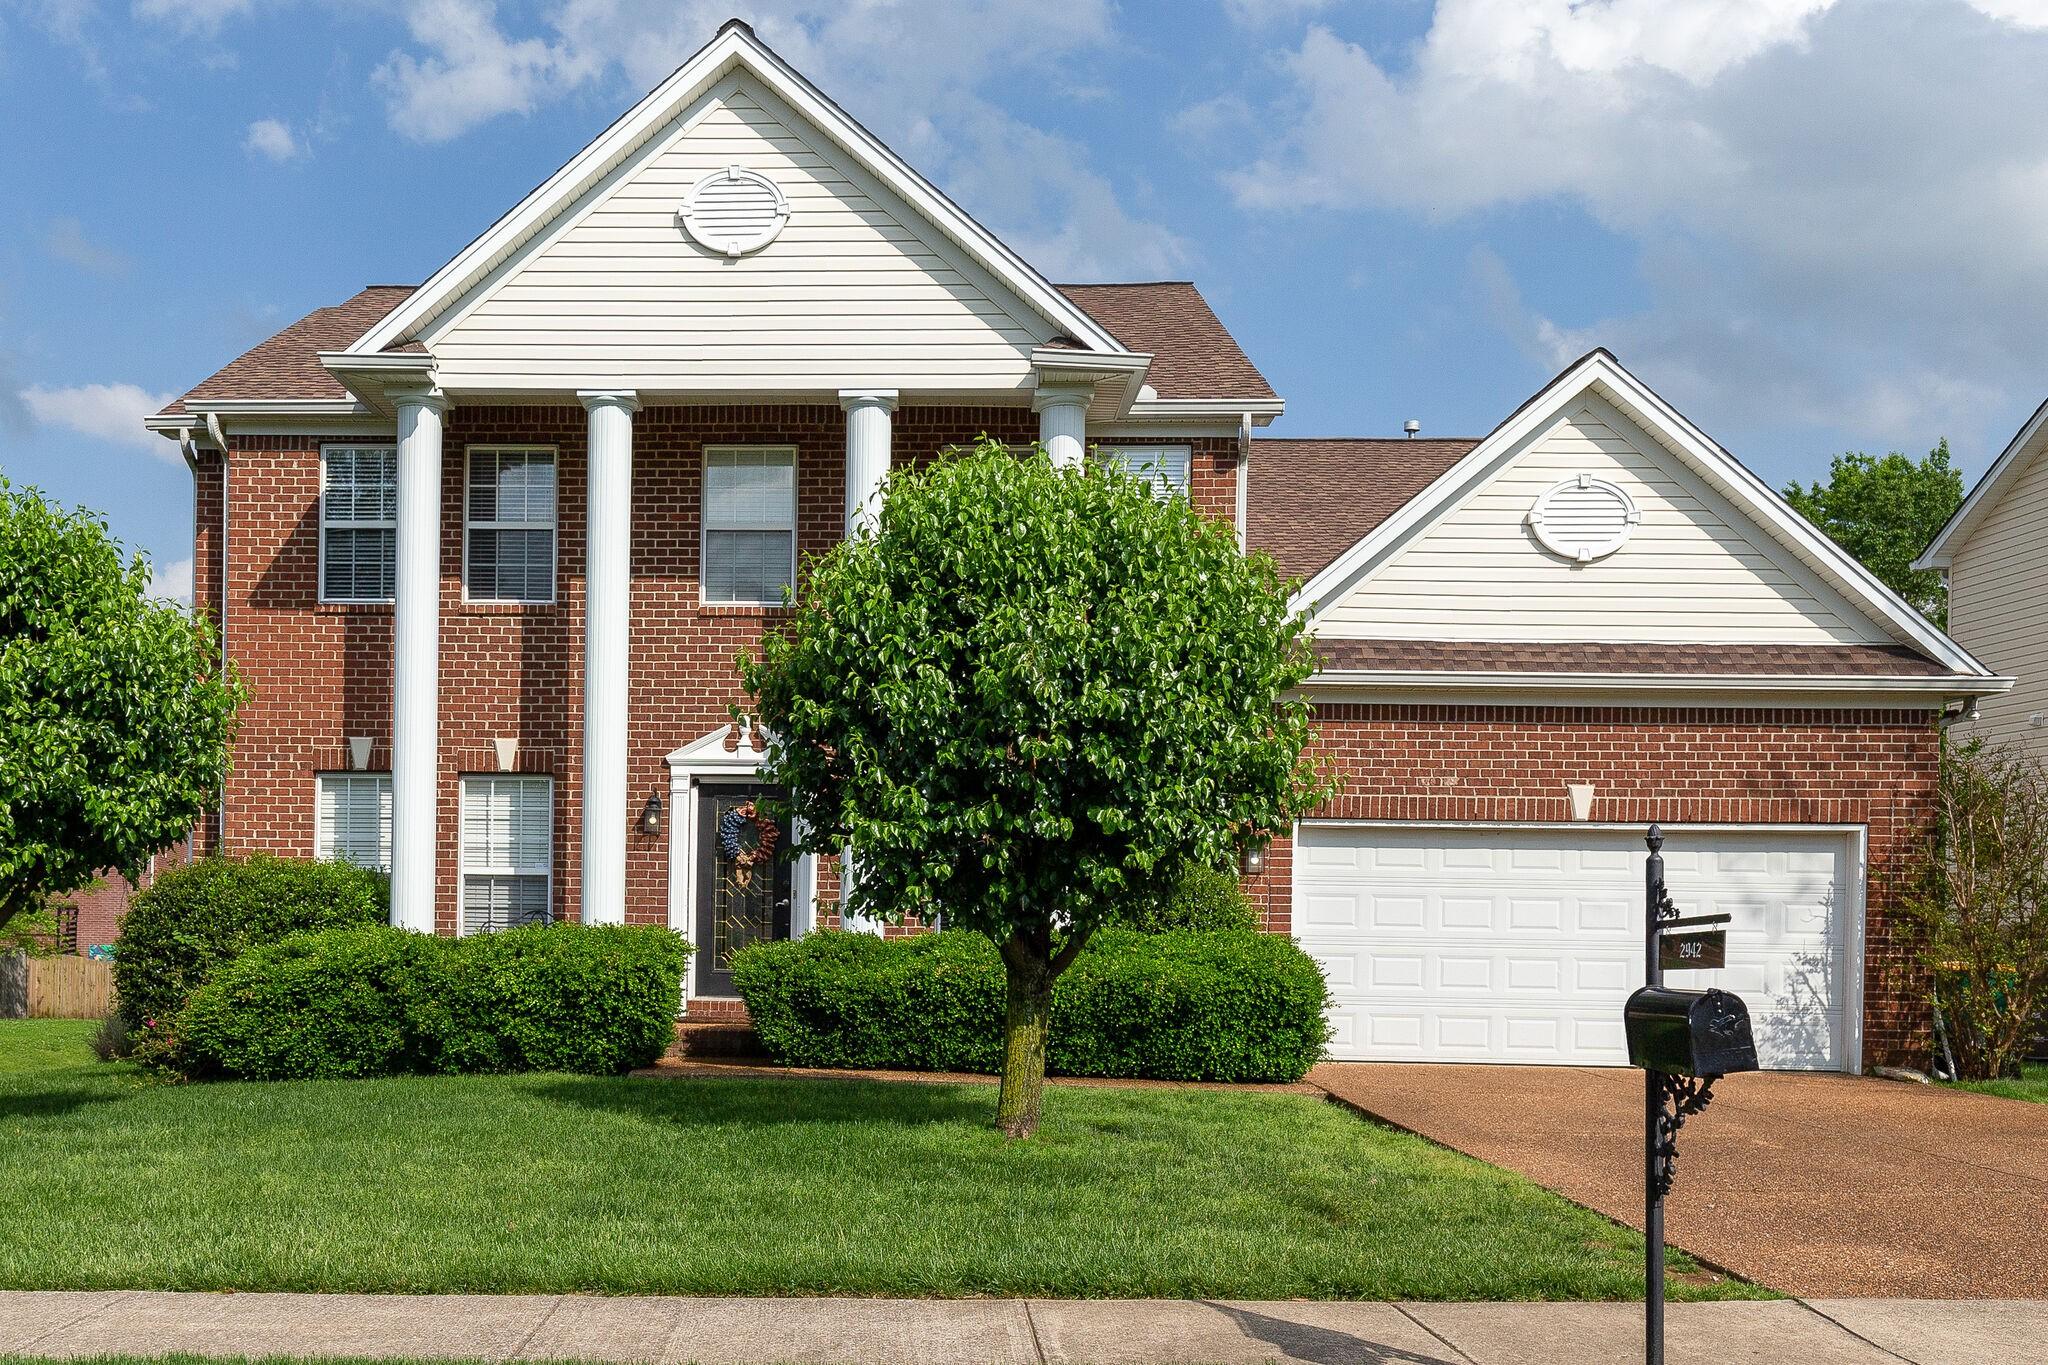 2942 Buckner Ln Property Photo - Spring Hill, TN real estate listing